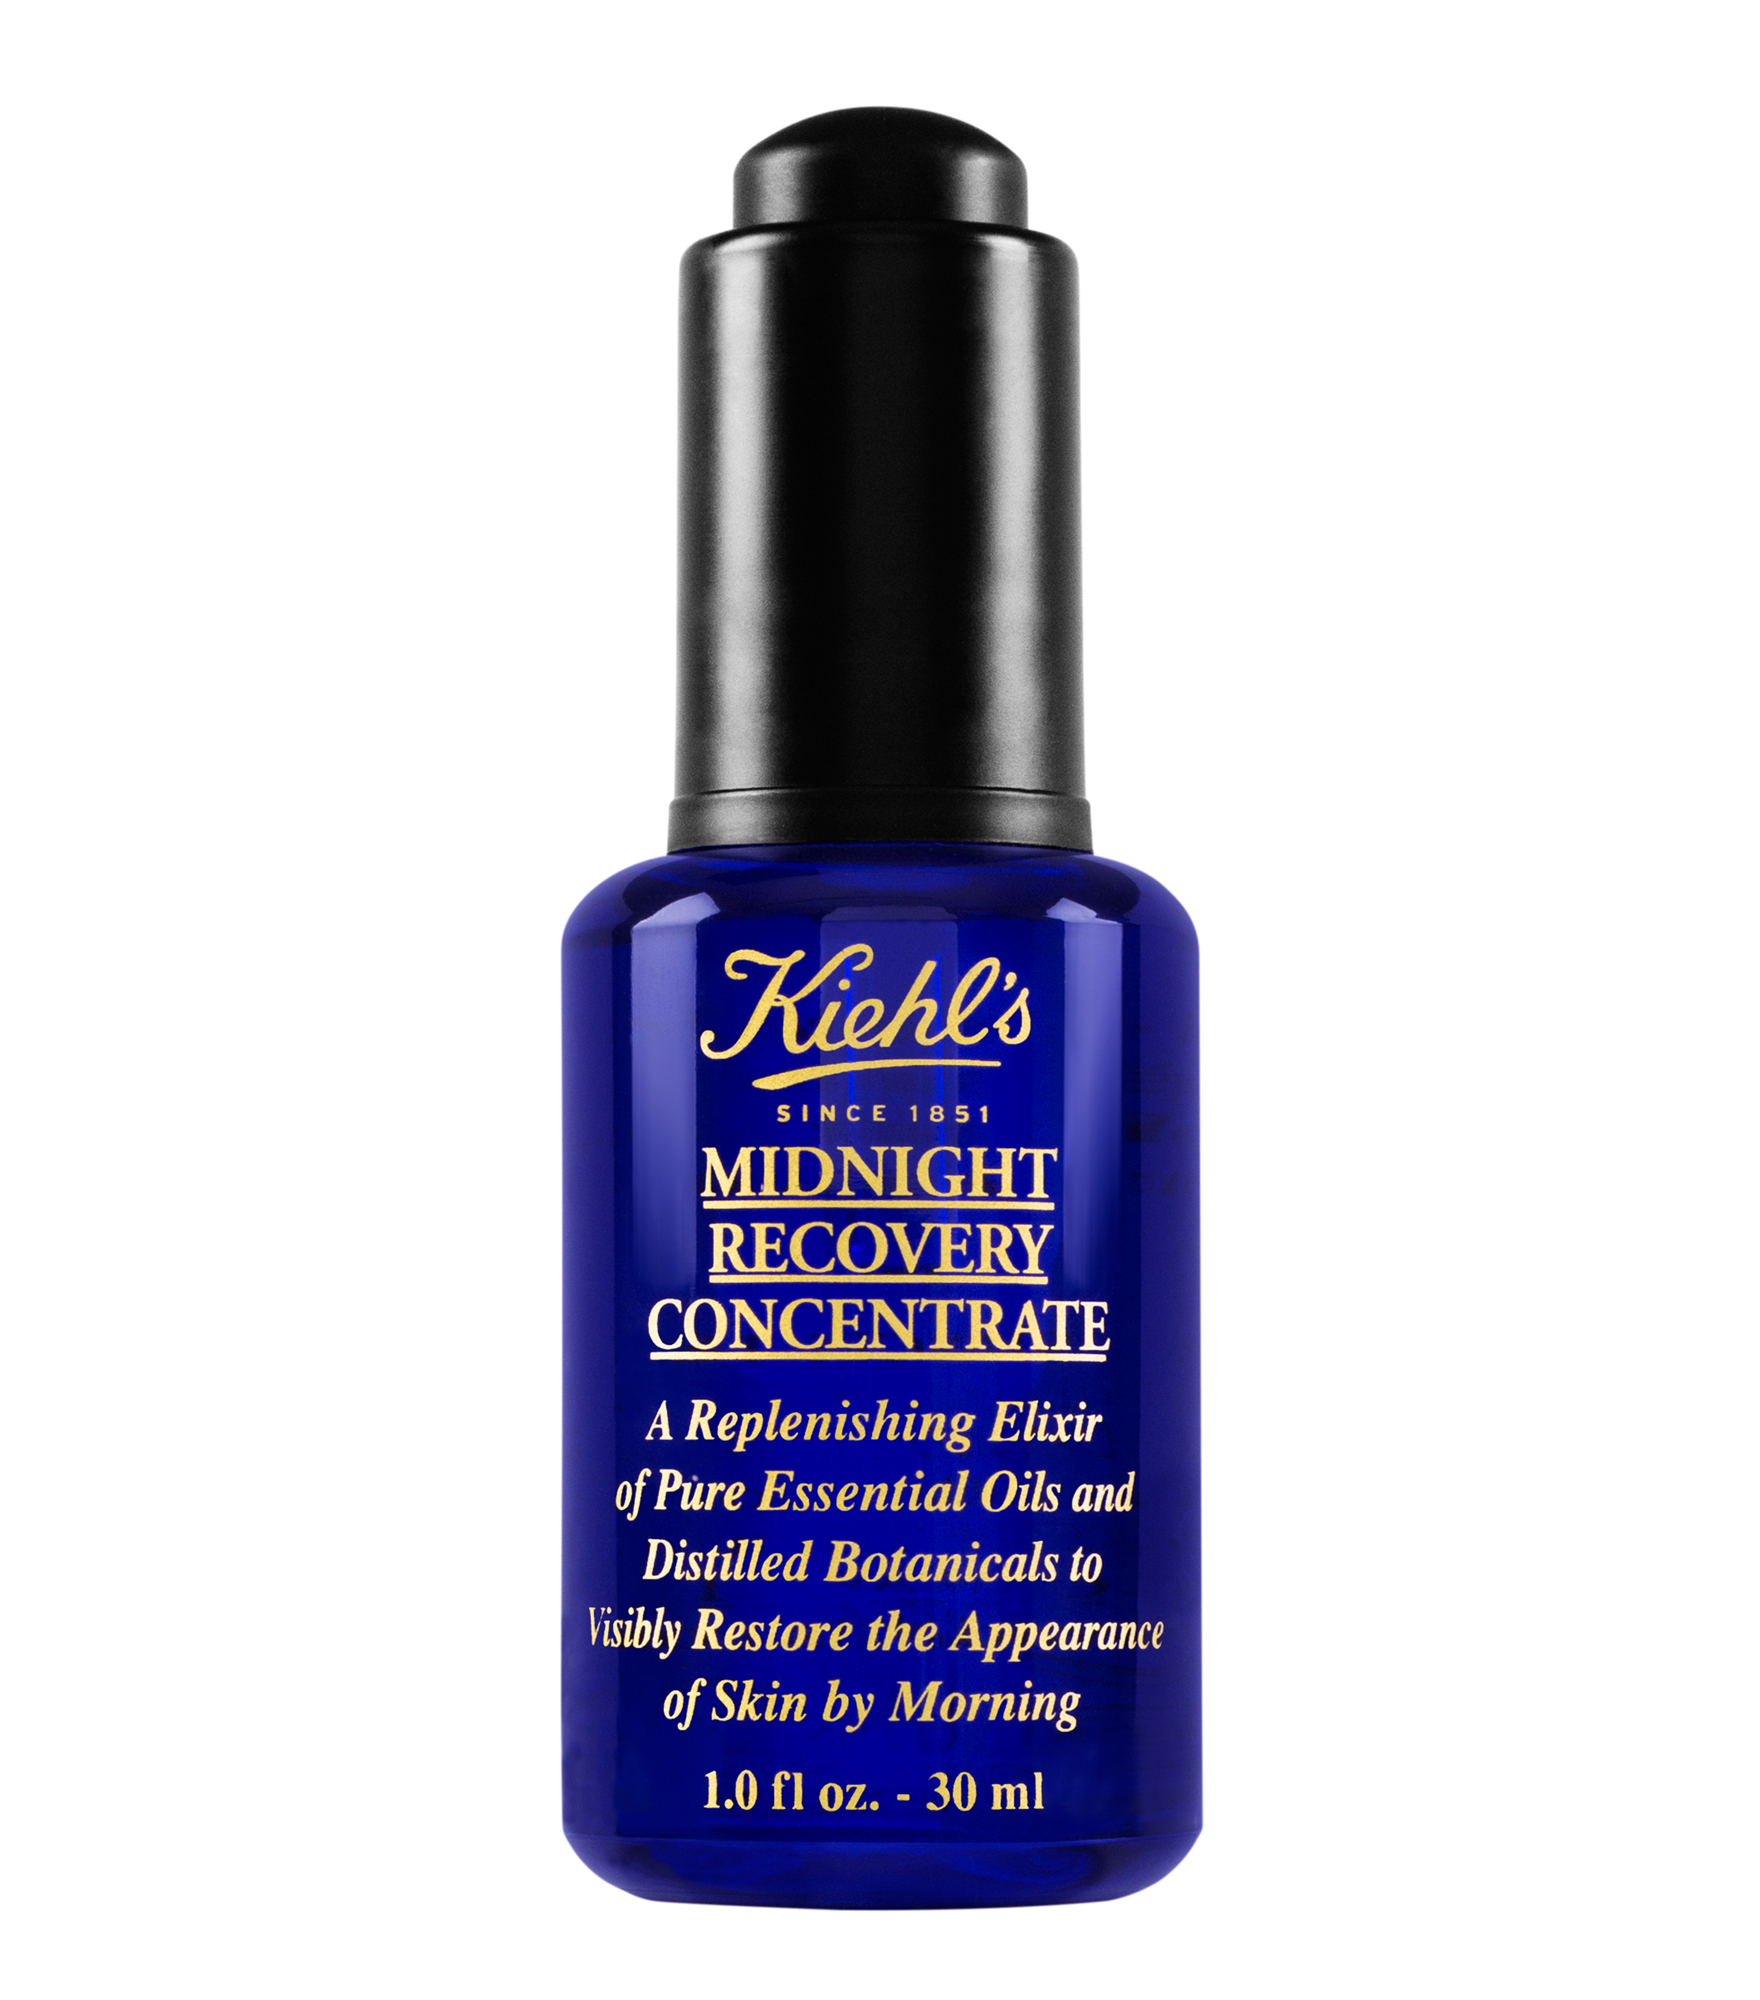 kiehls-midnight-recovery